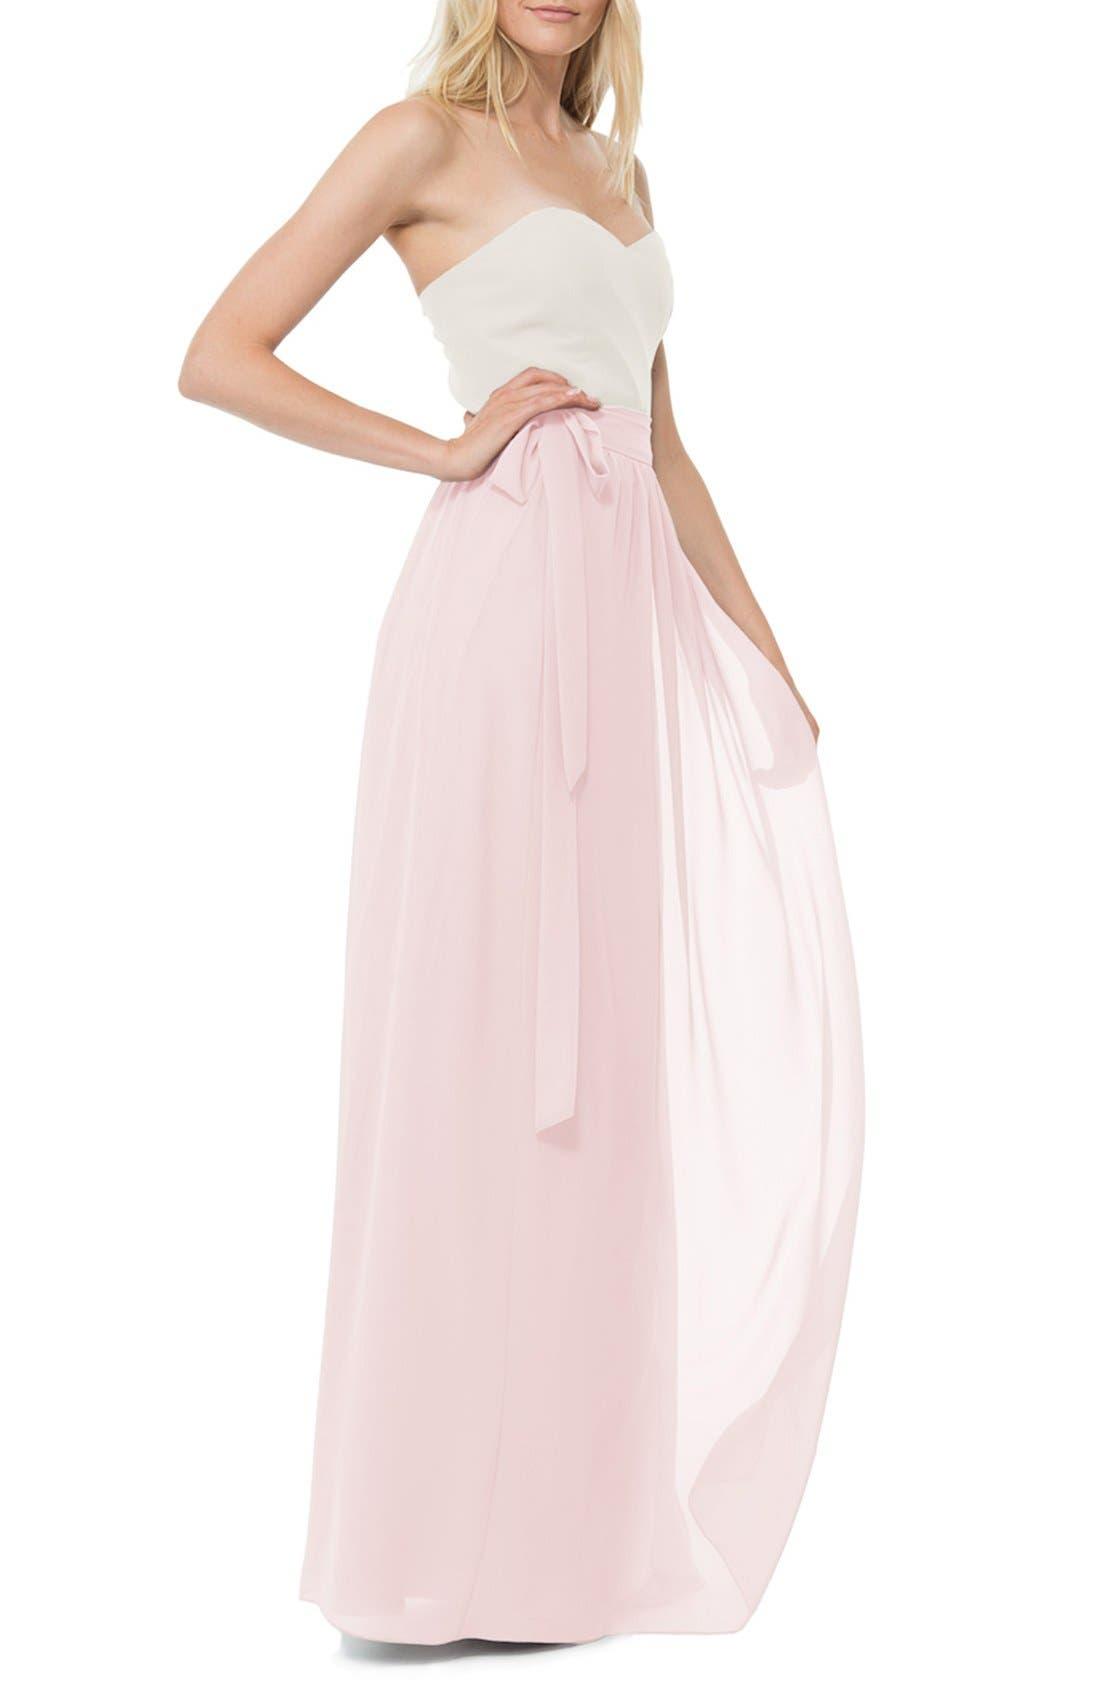 Main Image - Ceremony by Joanna August 'Whitney' Chiffon Wrap Maxi Skirt